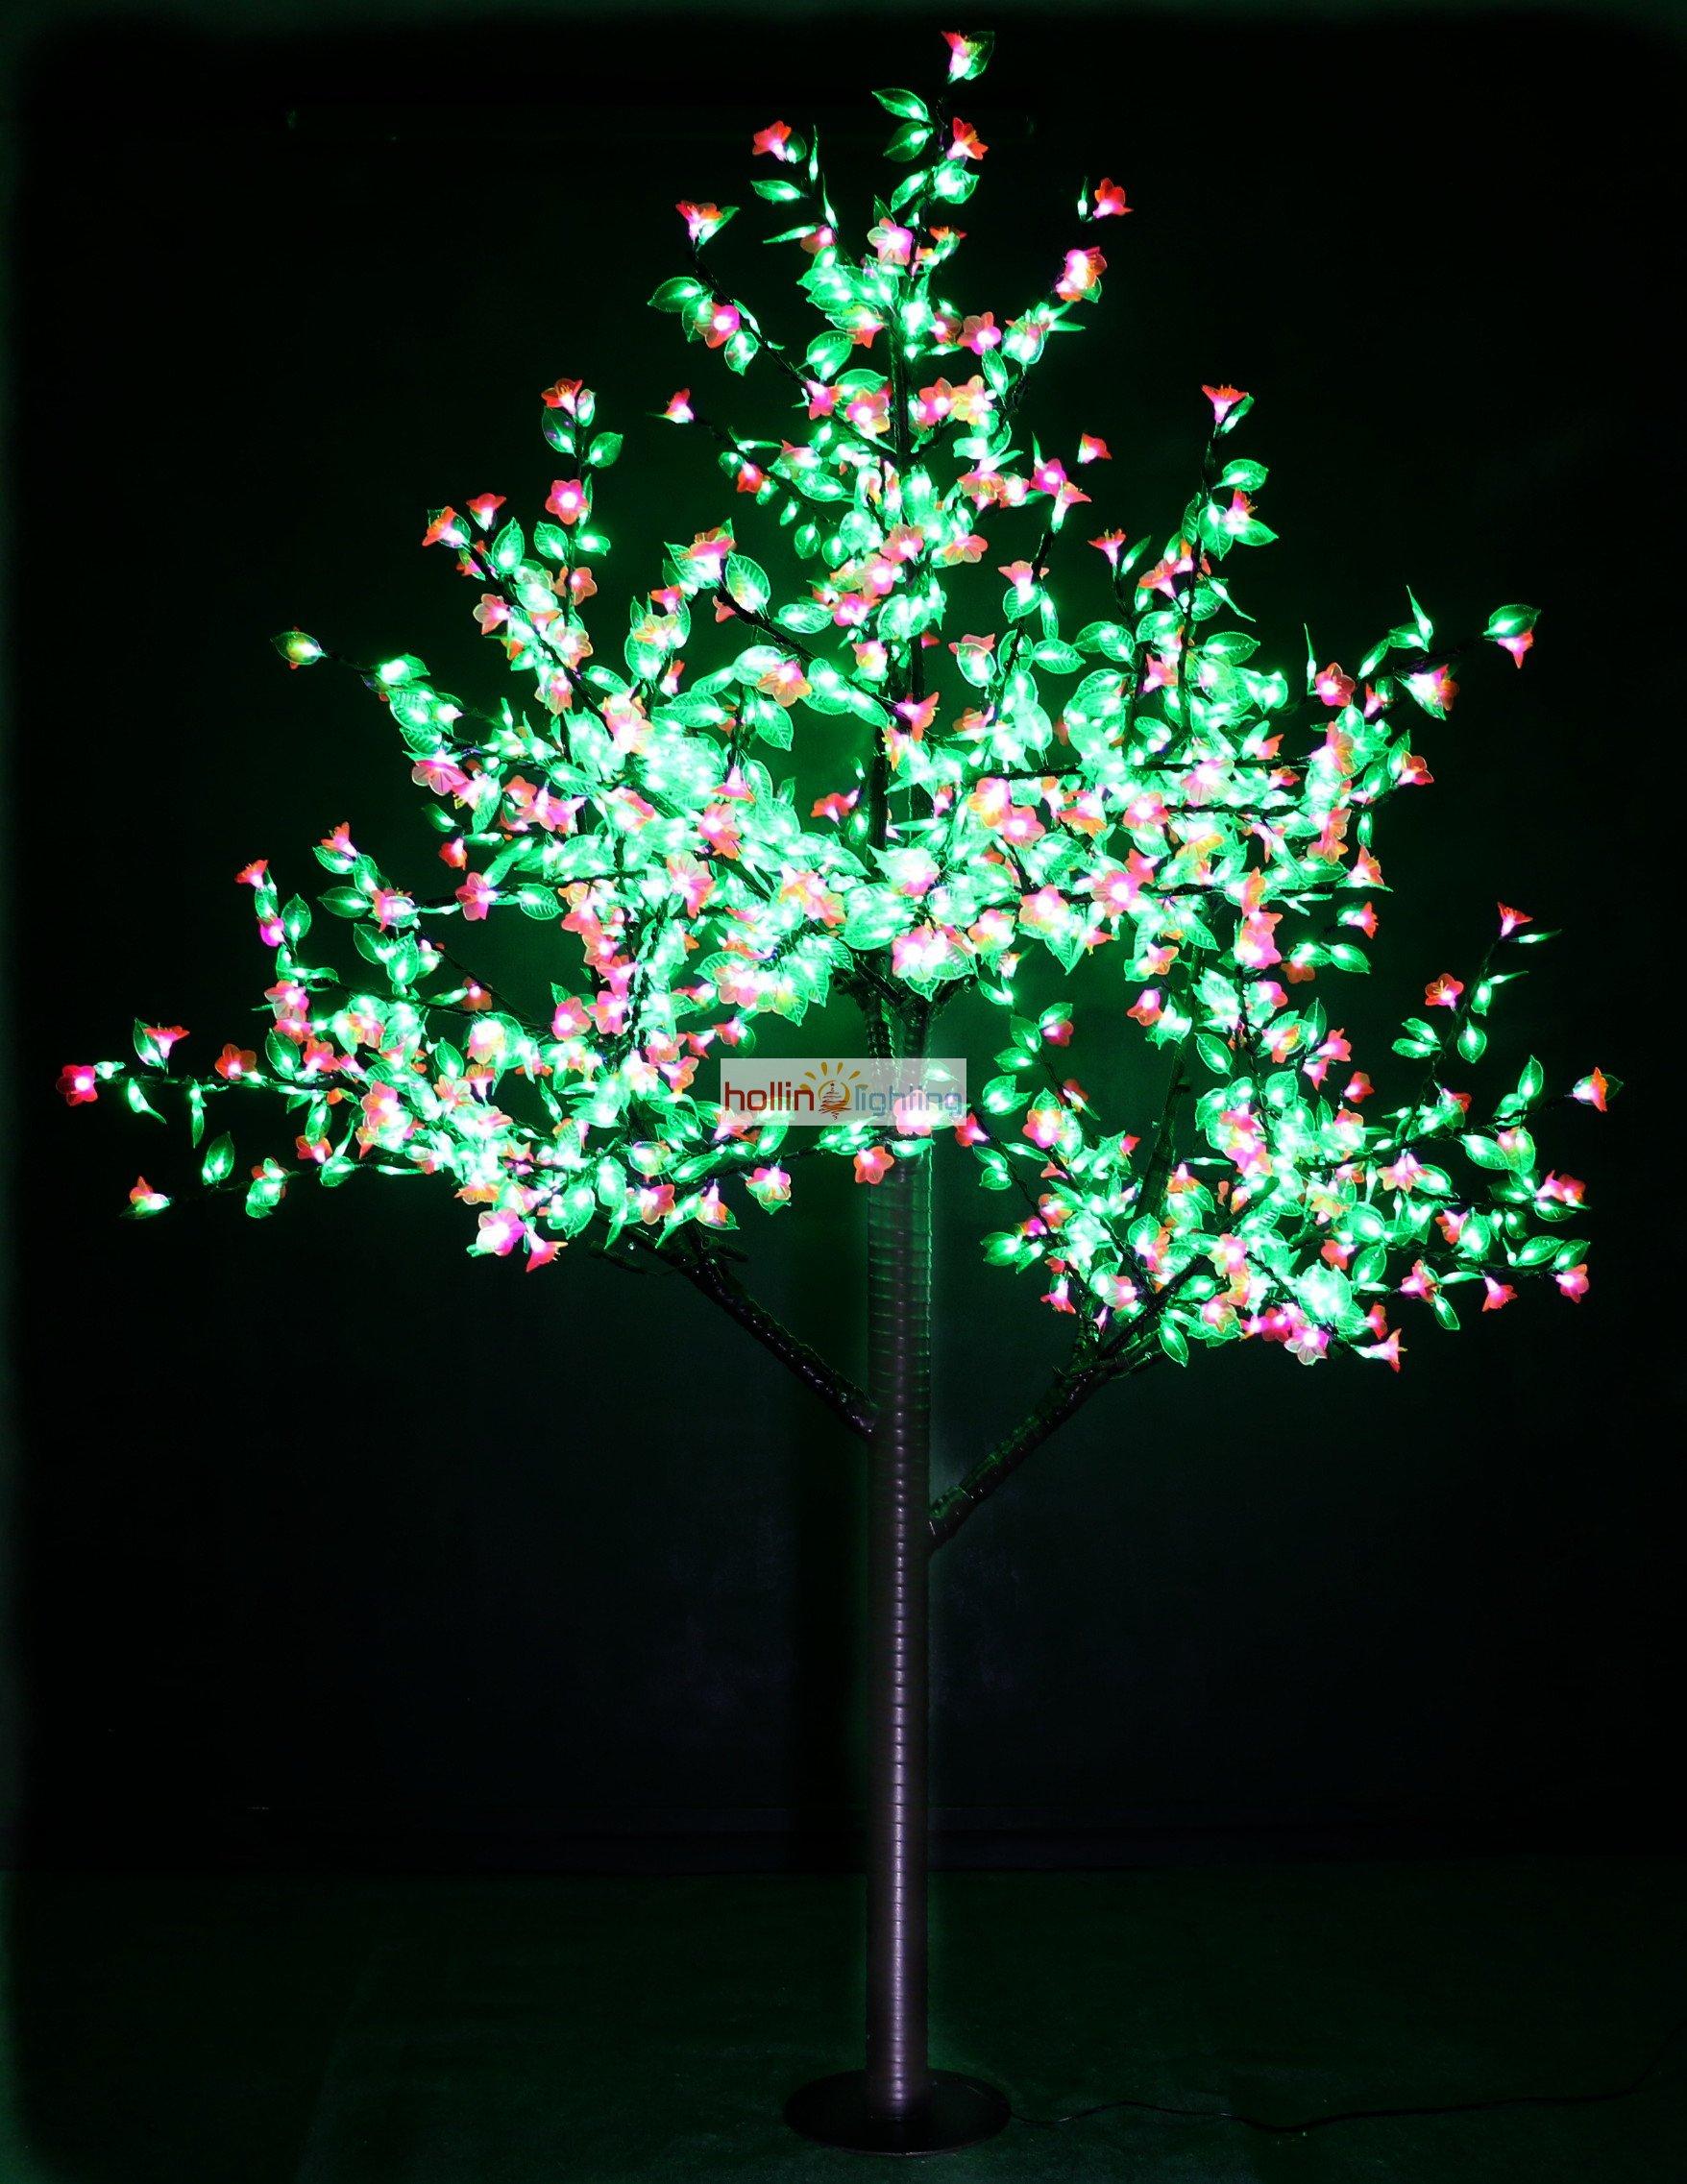 wholesale led simulation cherry tree light-hollinlighting